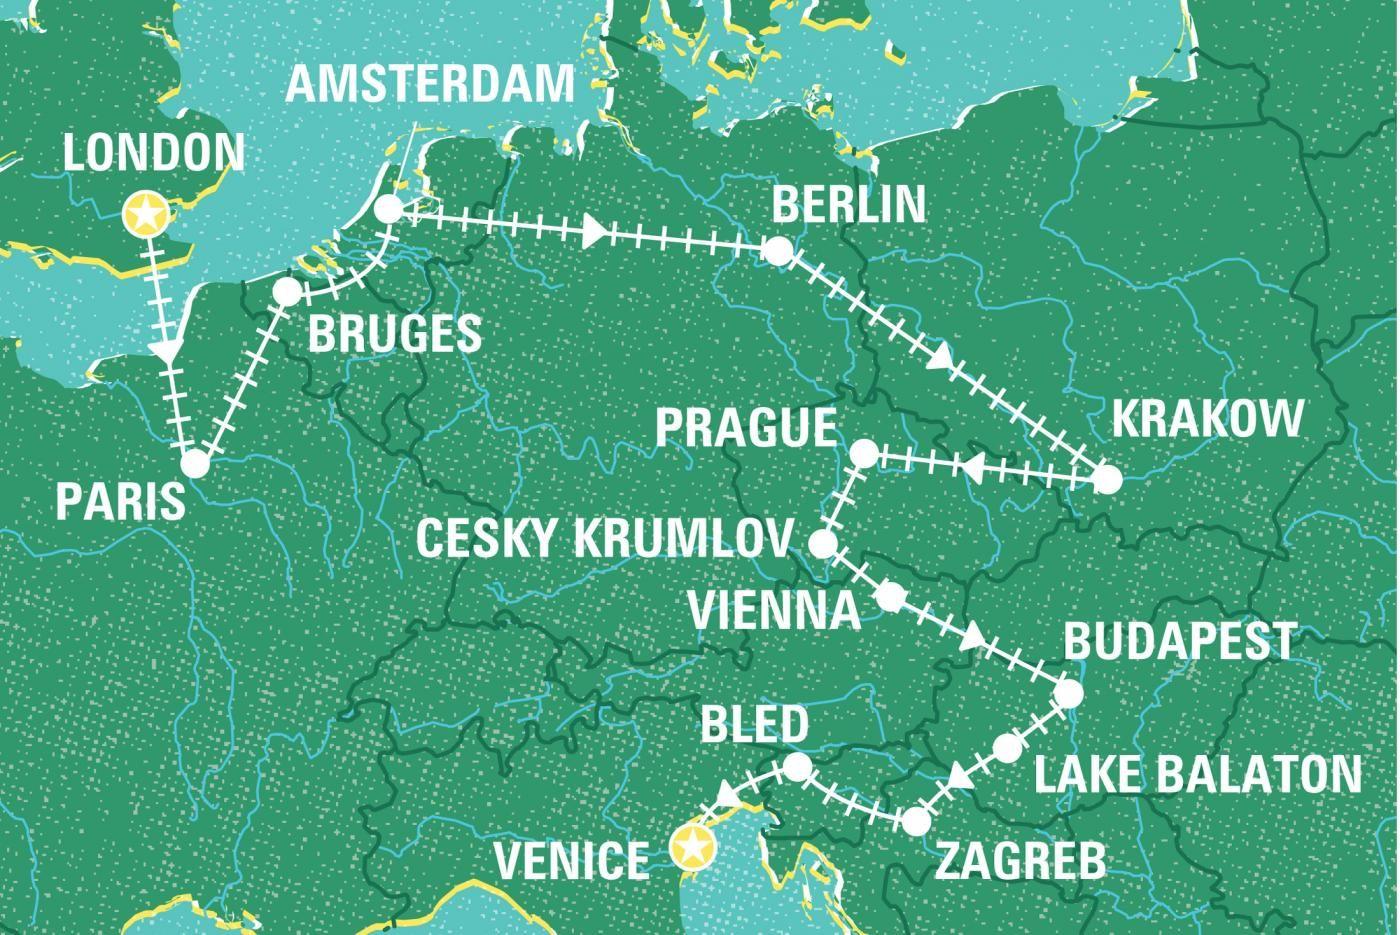 London To Venice By Rail Germany Tours Geckos Adventures Nz Intrepid Travel Cesky Krumlov Venice